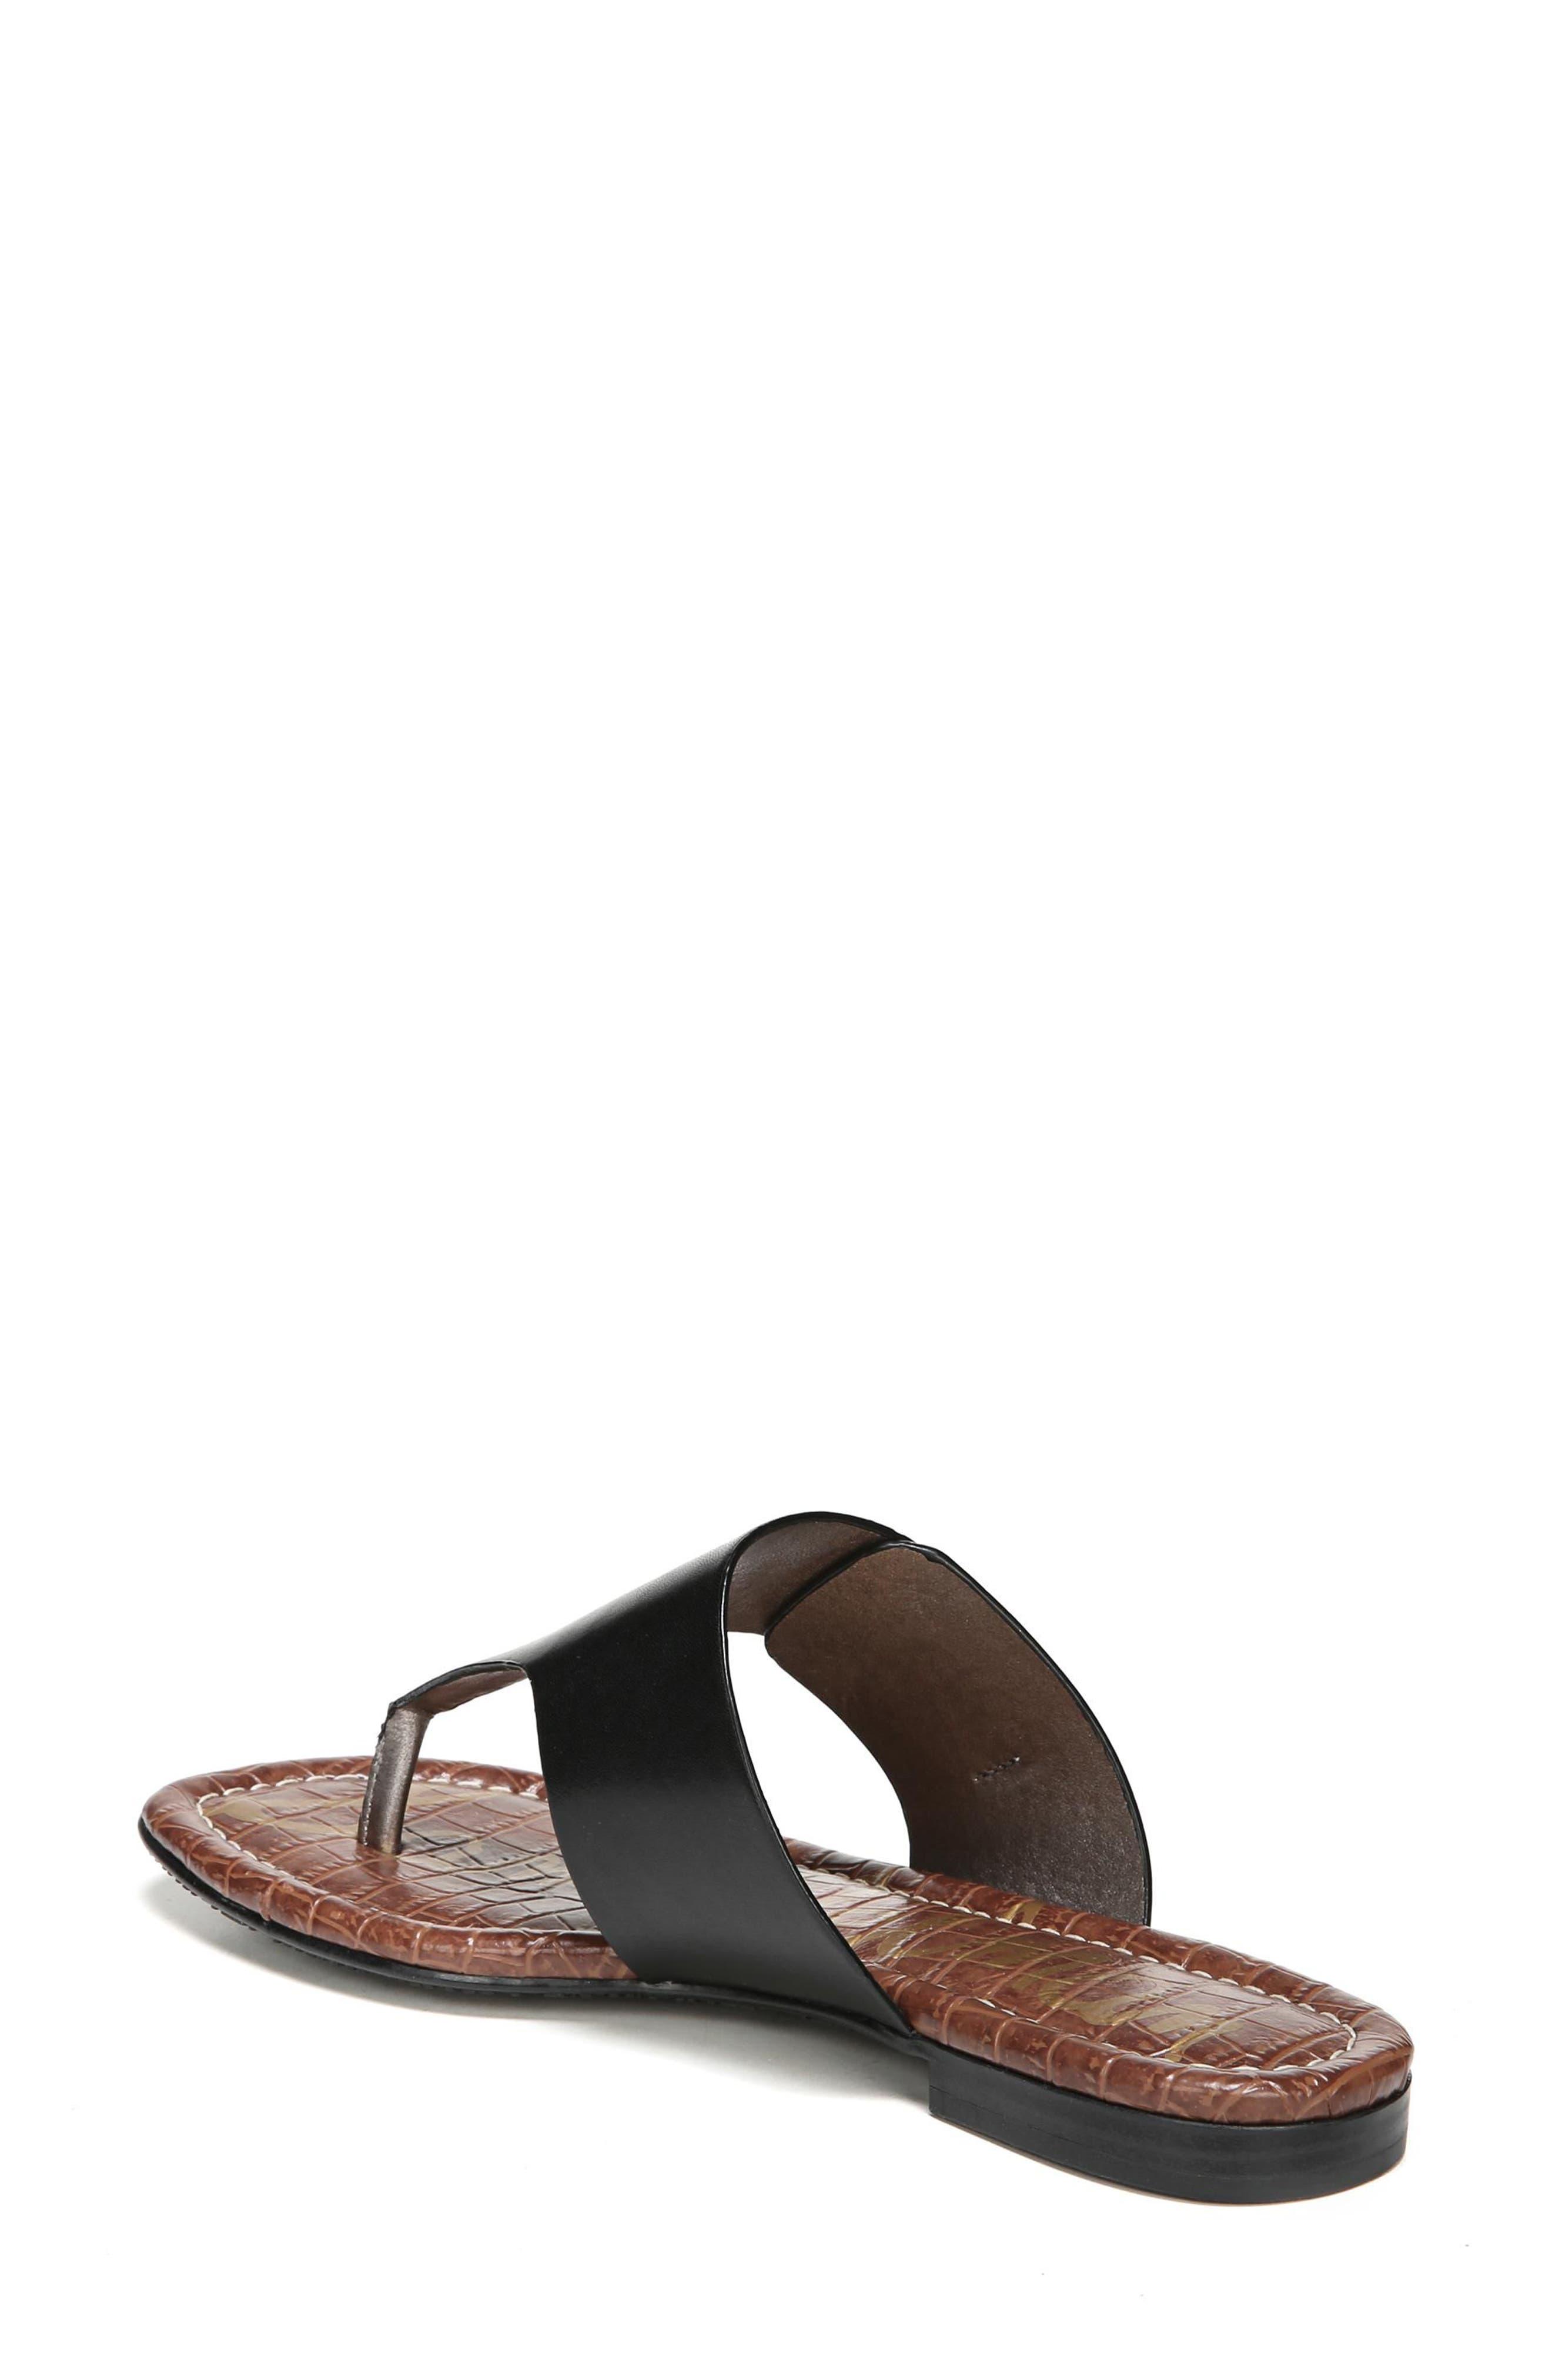 Barry V-Strap Thong Sandal,                             Alternate thumbnail 2, color,                             001